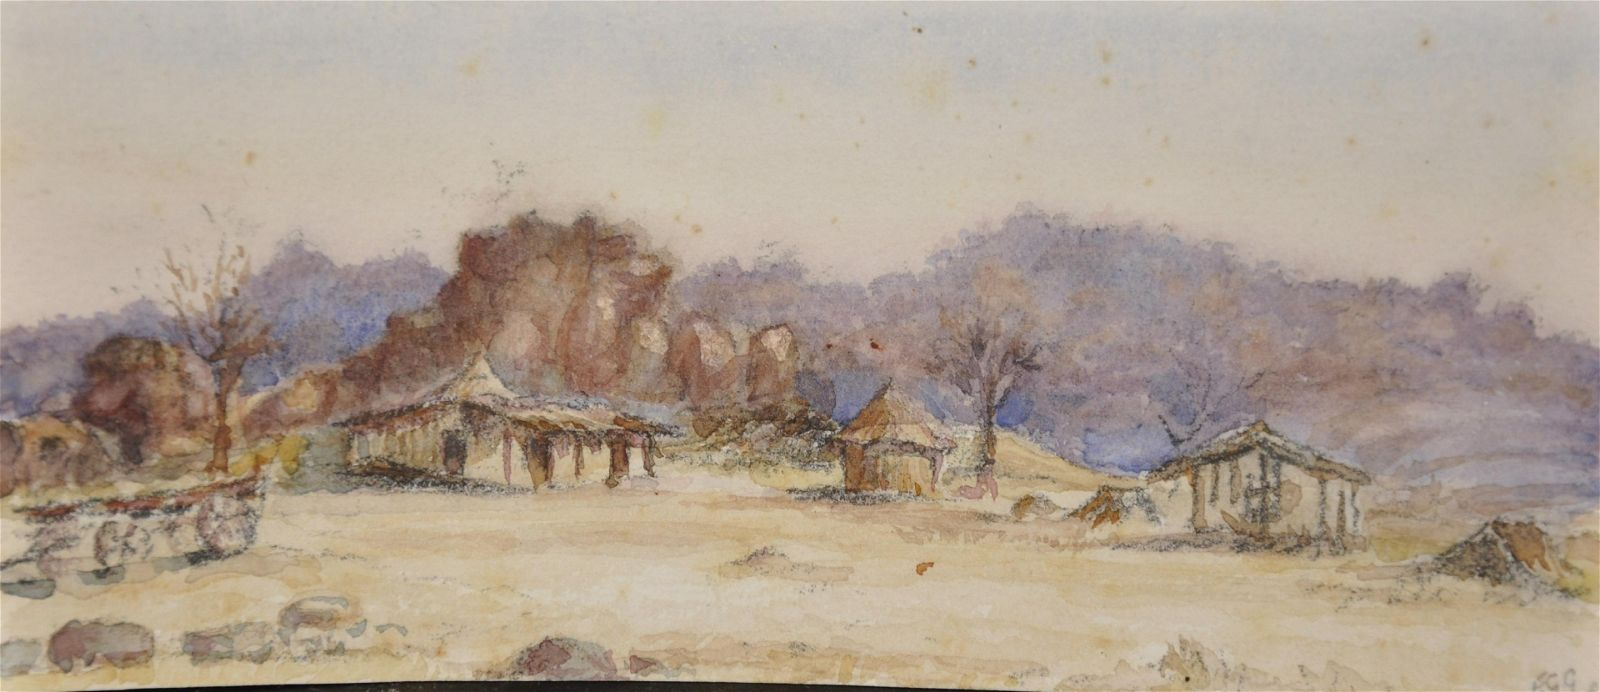 Frederick G... Green (19th - 20th Century) British.